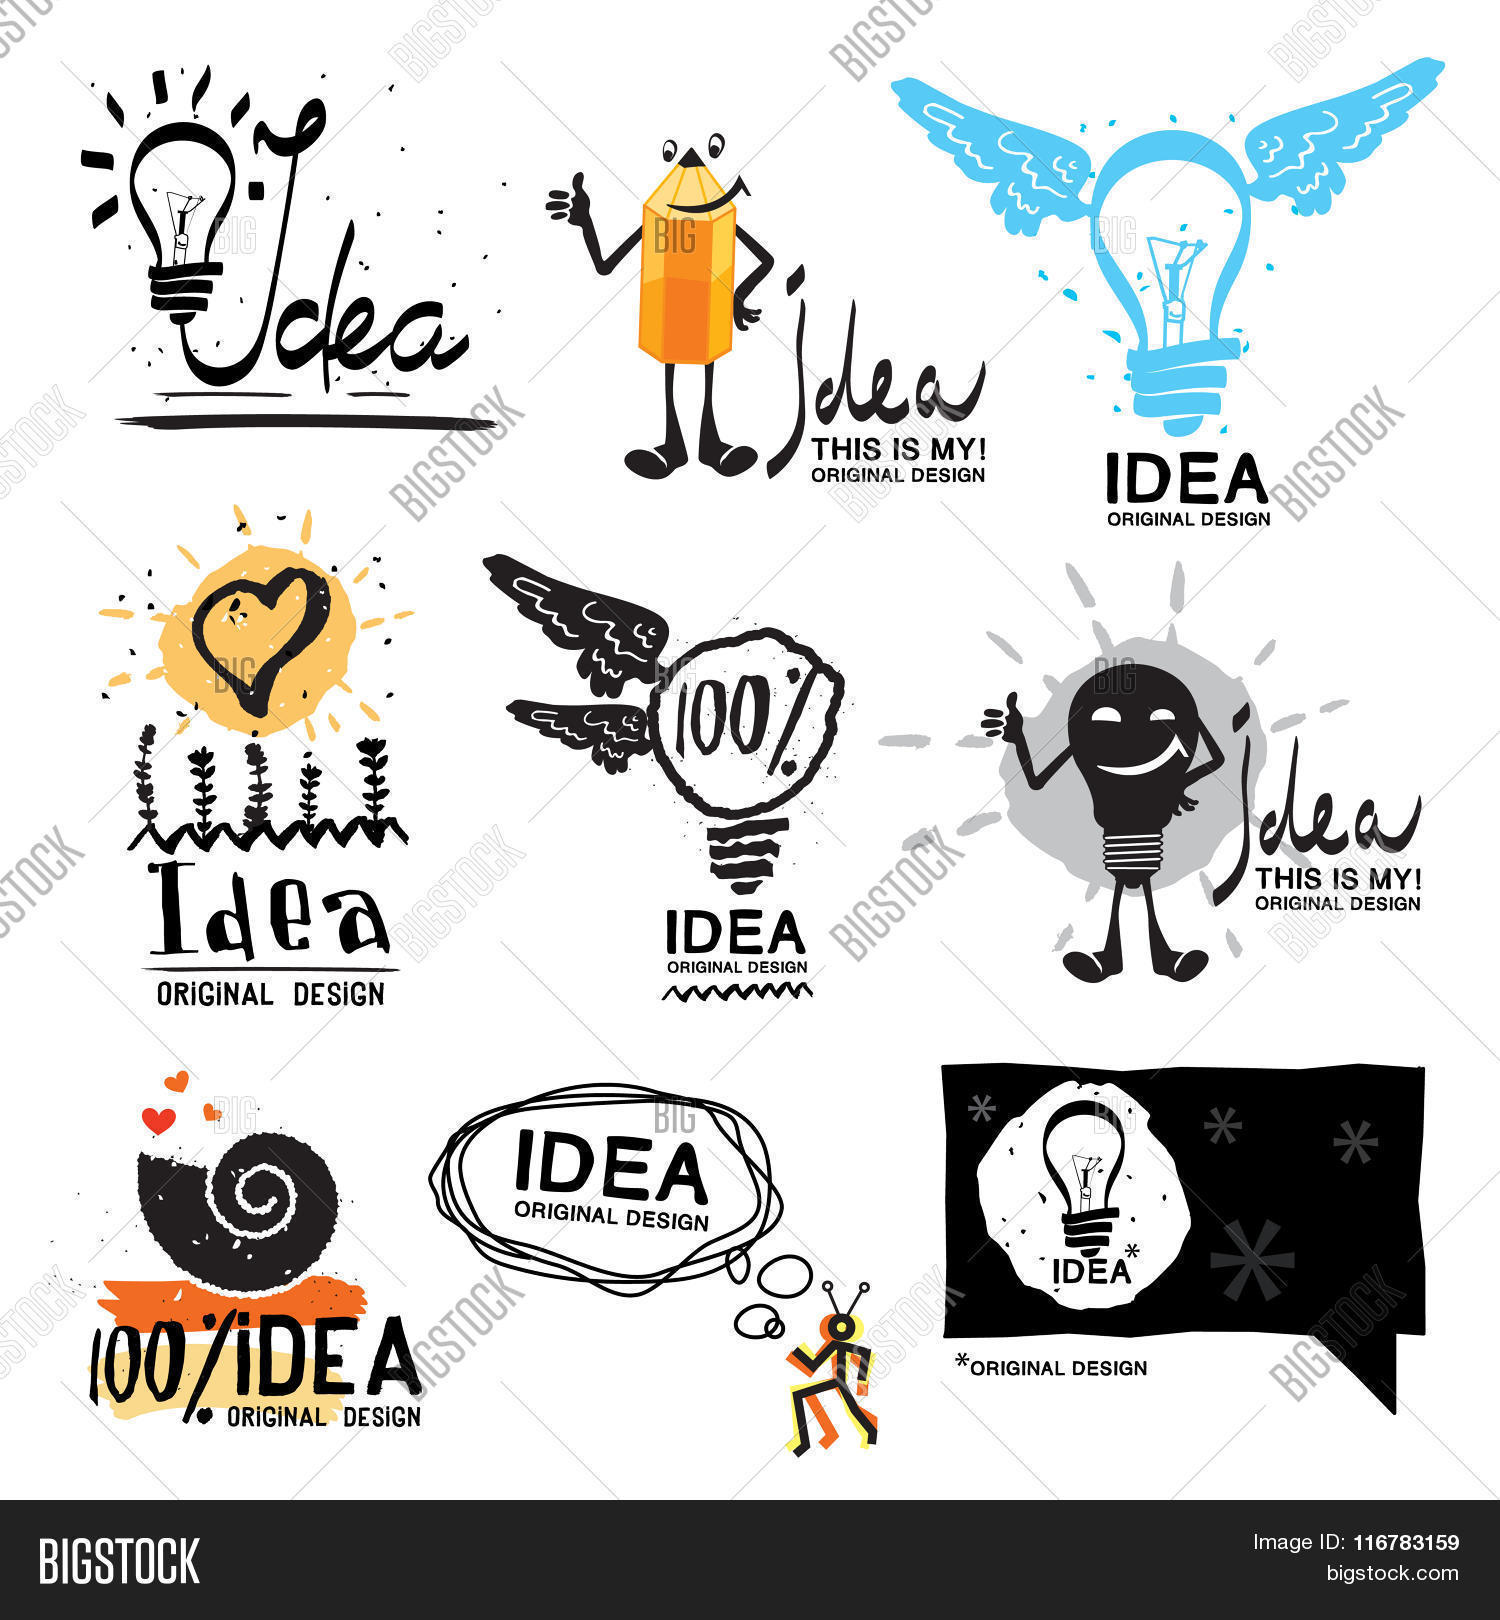 idea with logo symbol